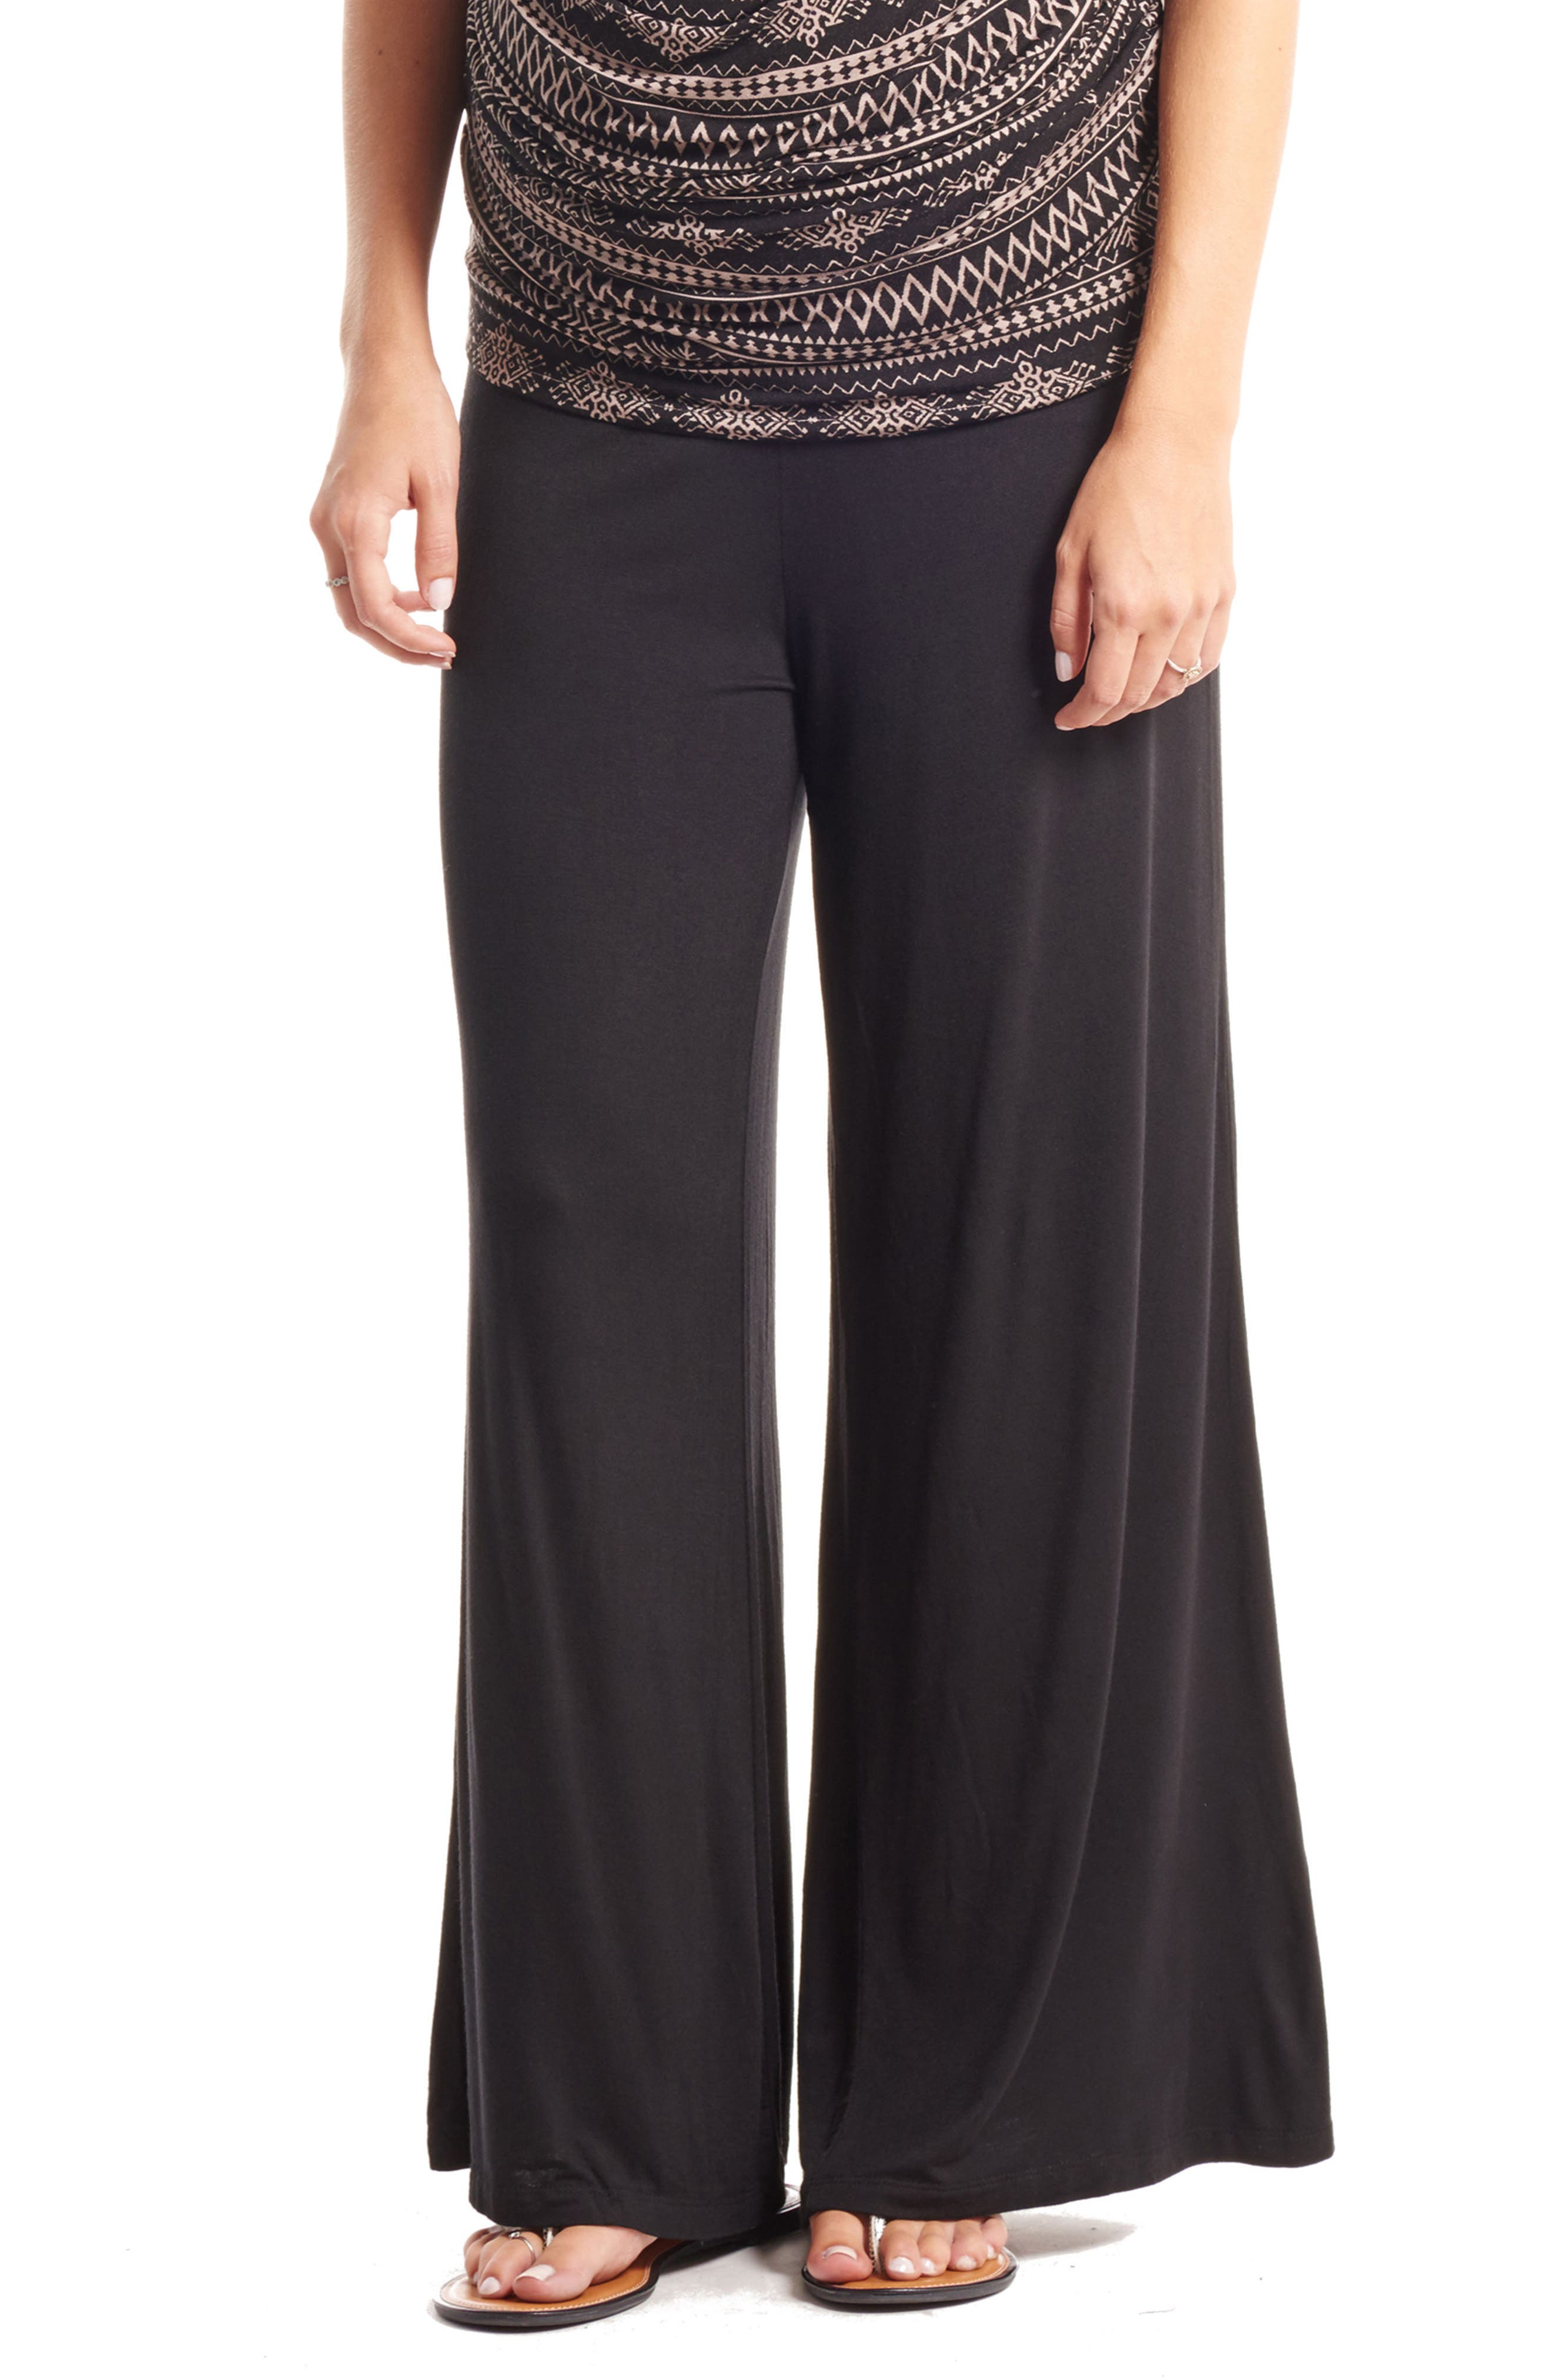 'Isla' Maternity Pants,                         Main,                         color, Black Noir